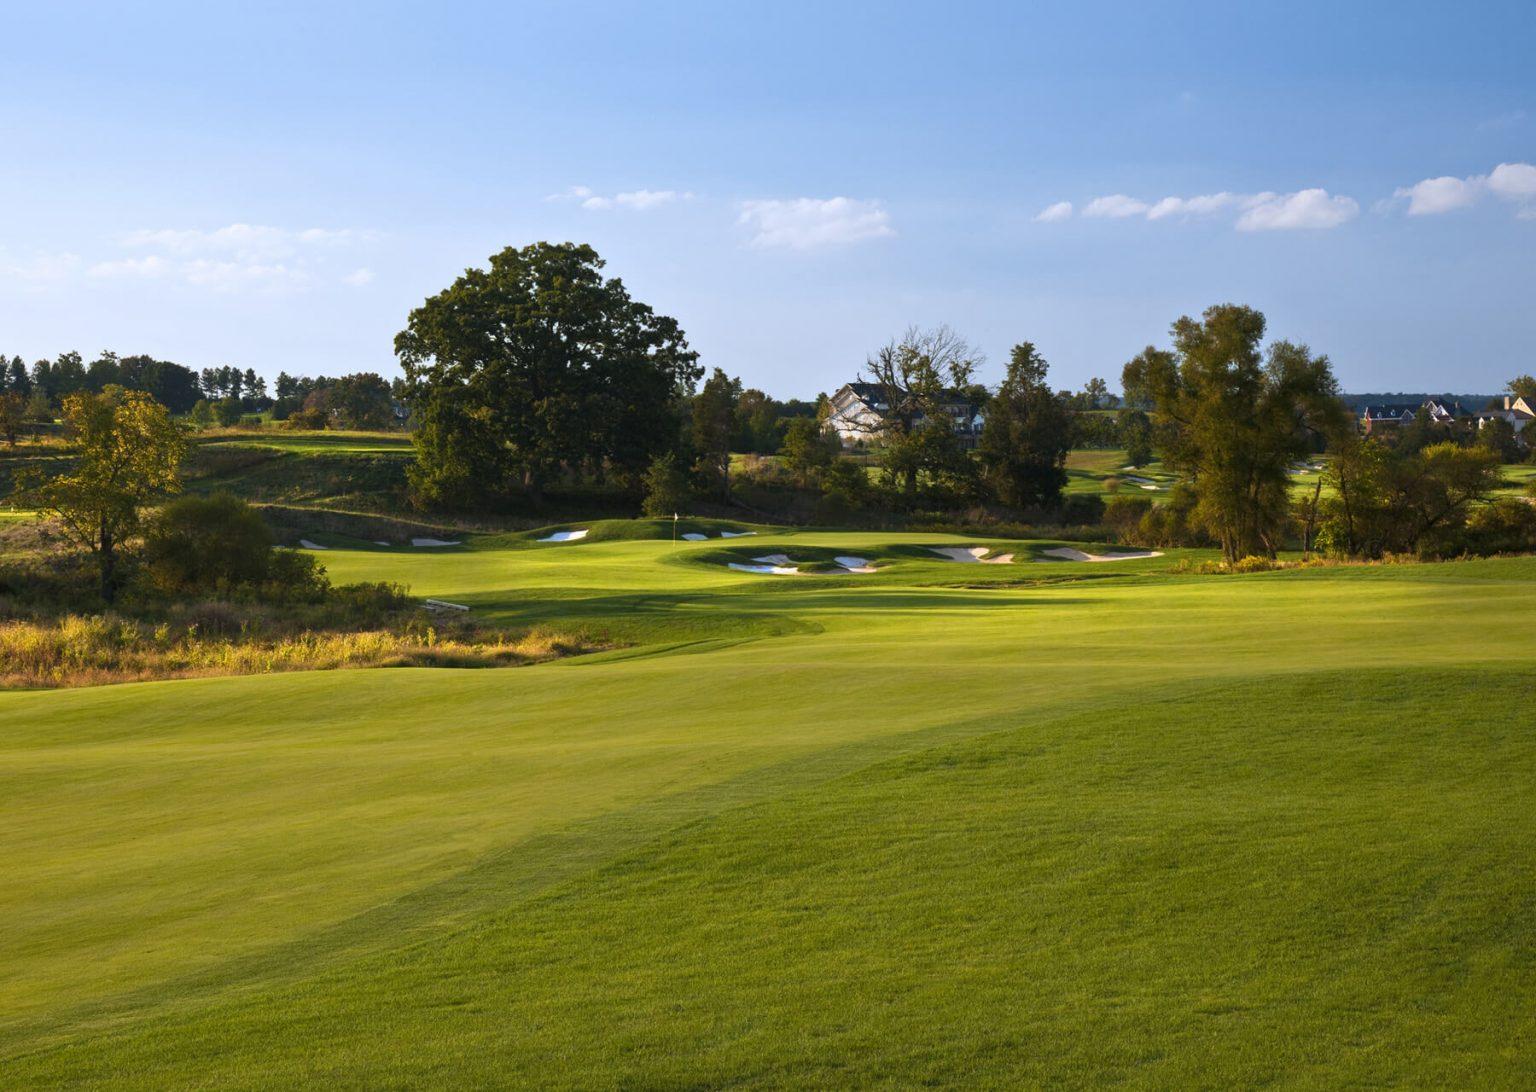 beautiful golf course fairway